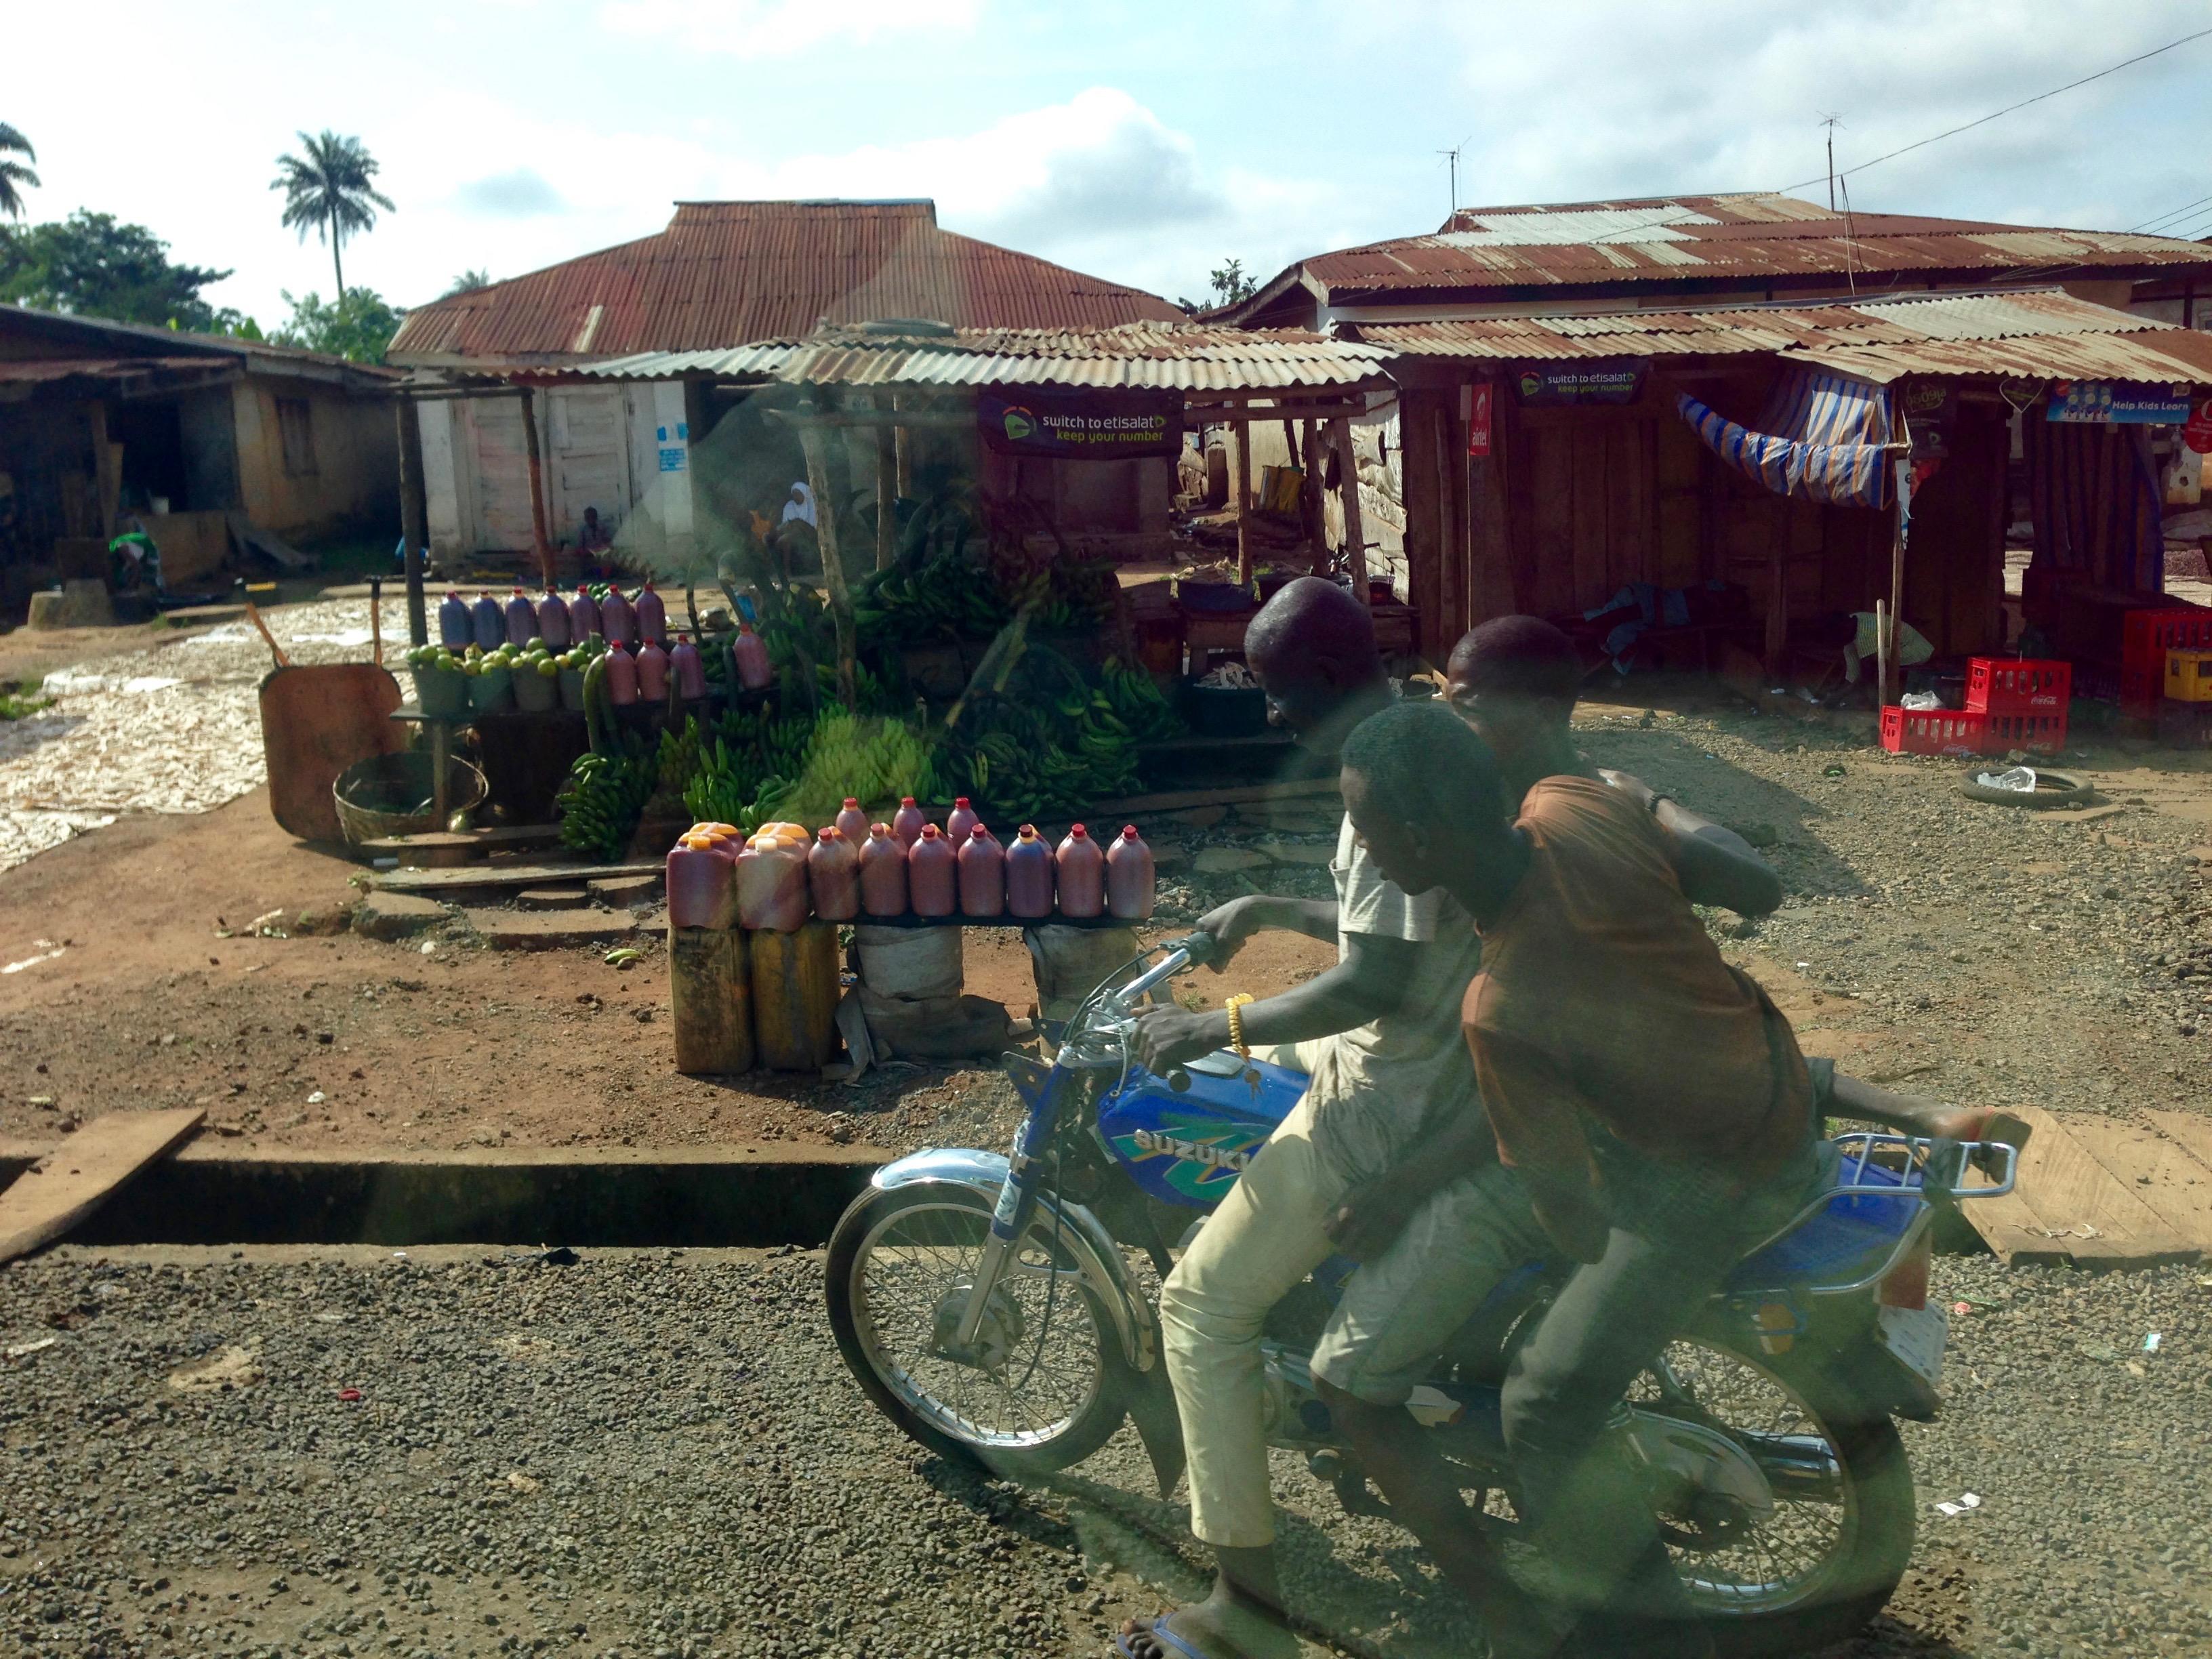 Motorcycling in Igbara Oke, Ondo, Nigeria. #JujuFilms